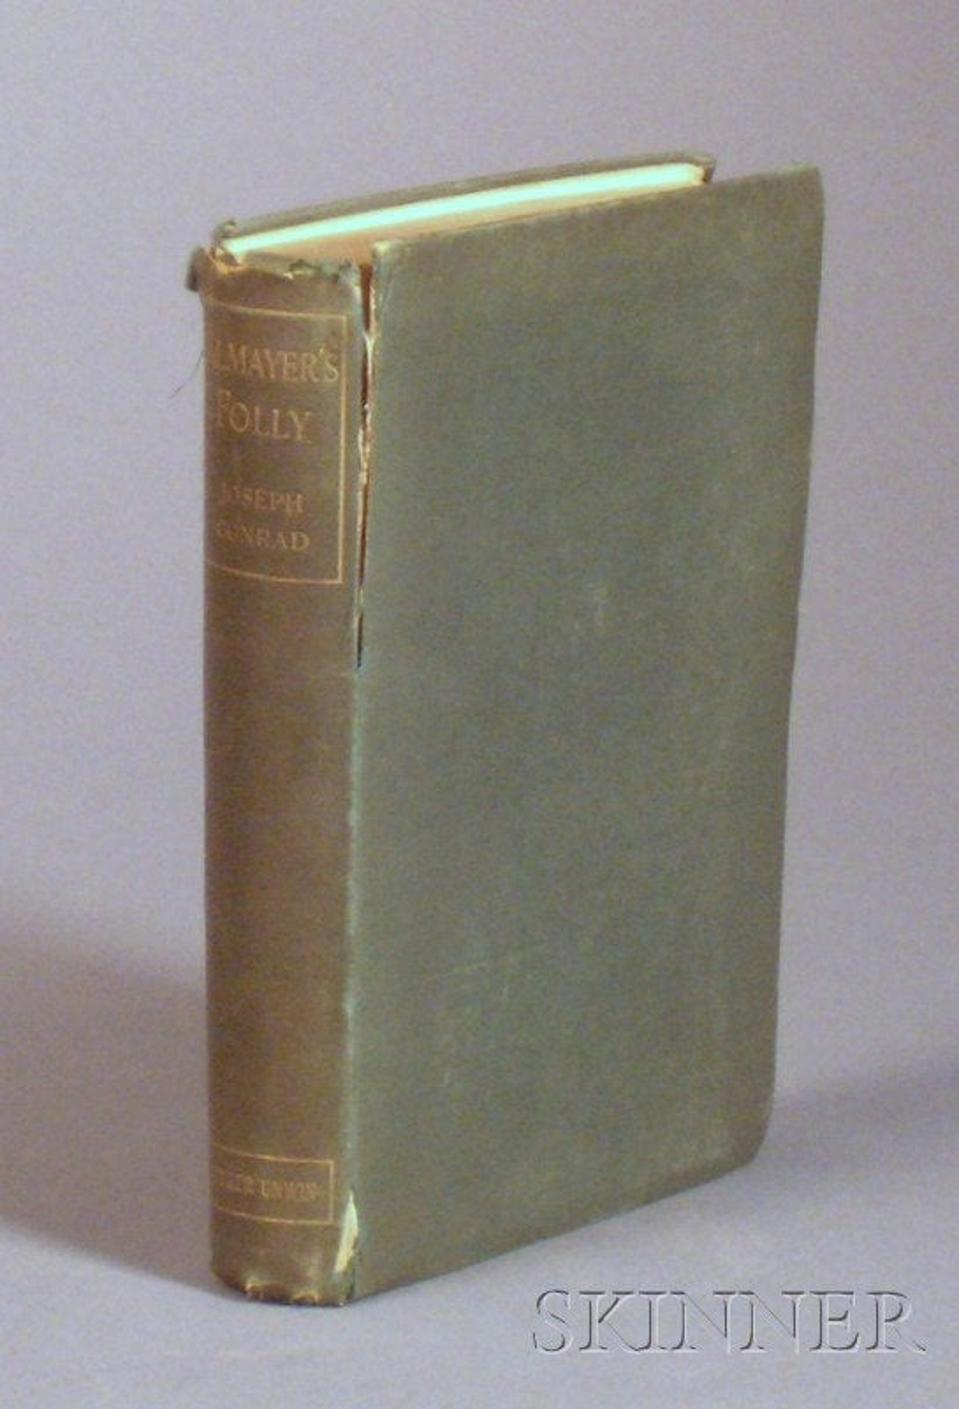 Autographed first edition of Joseph Conrad's ″Almayer's Folly″, damaged